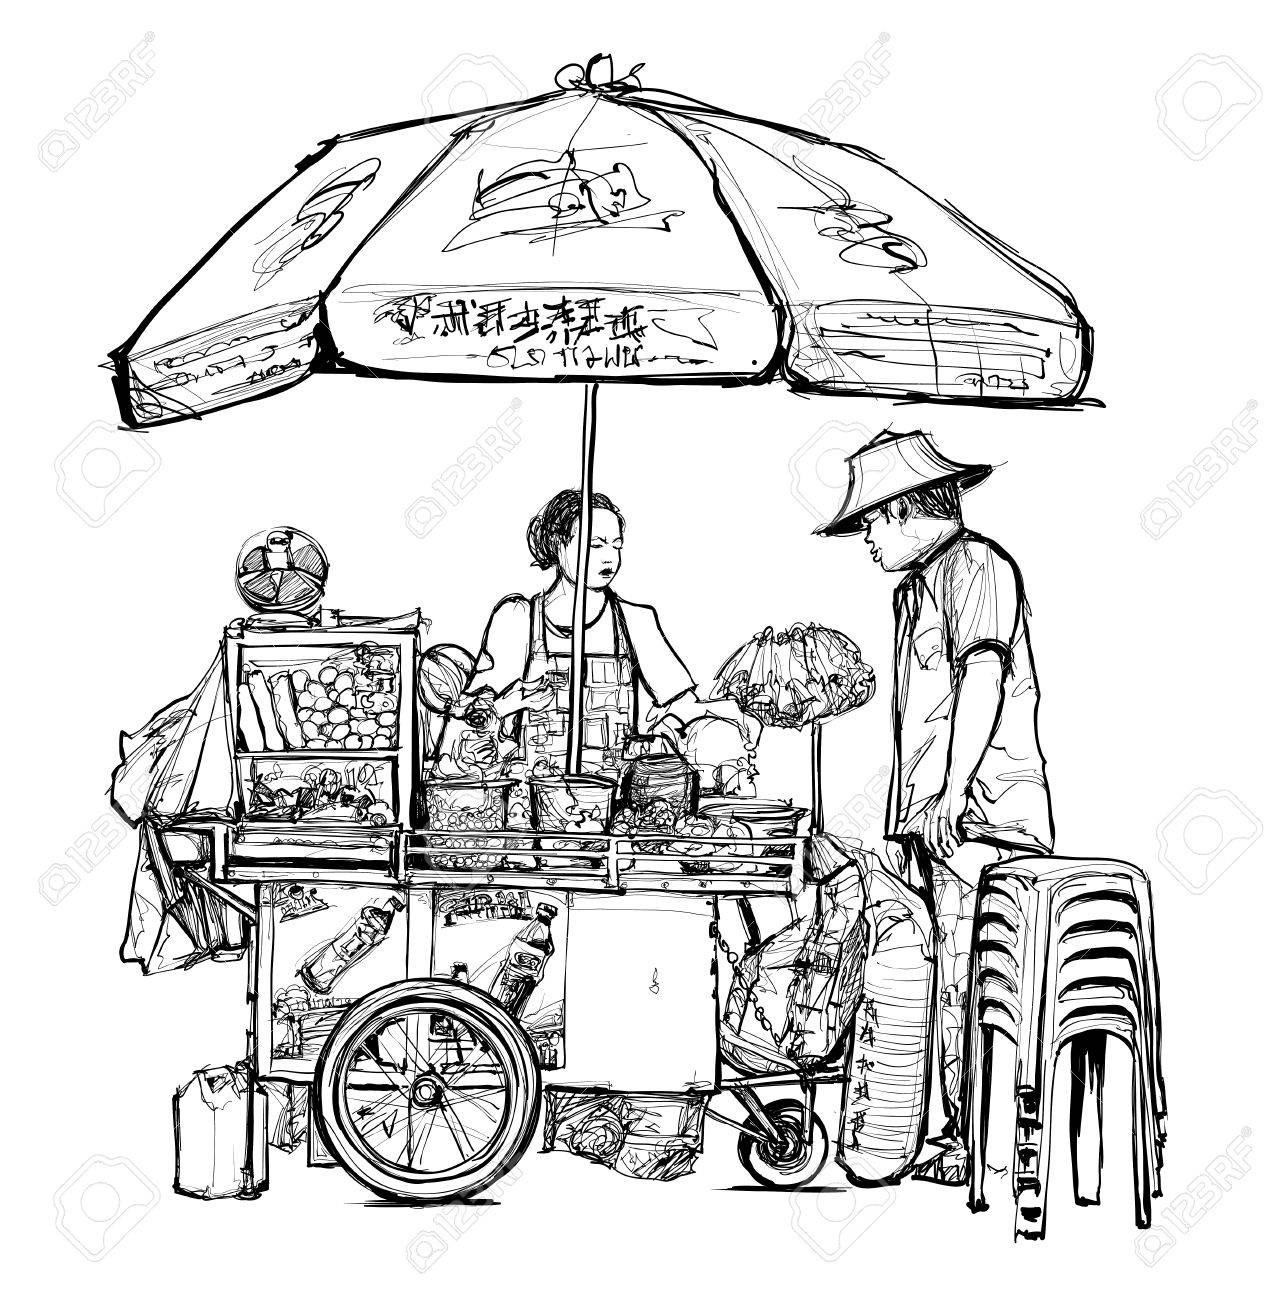 Street food seller in Bangkok (street, food, thailand) - vector illustration - 82091268